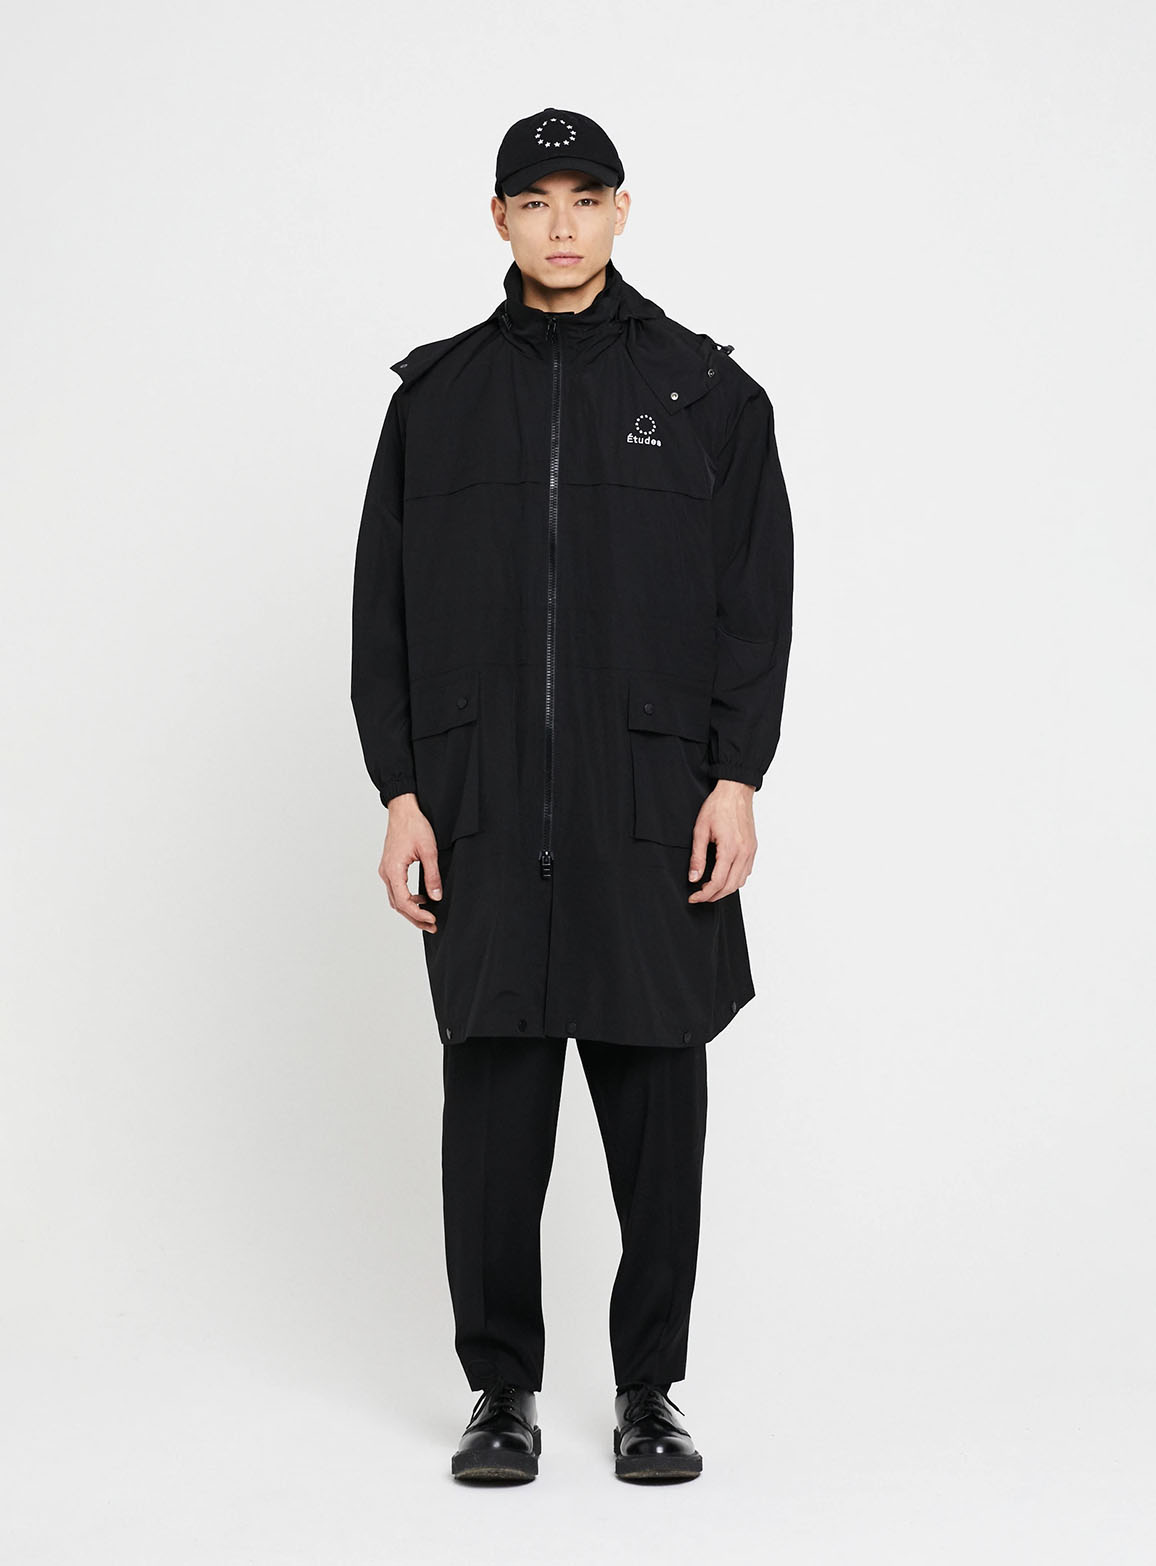 Air Full black jacket